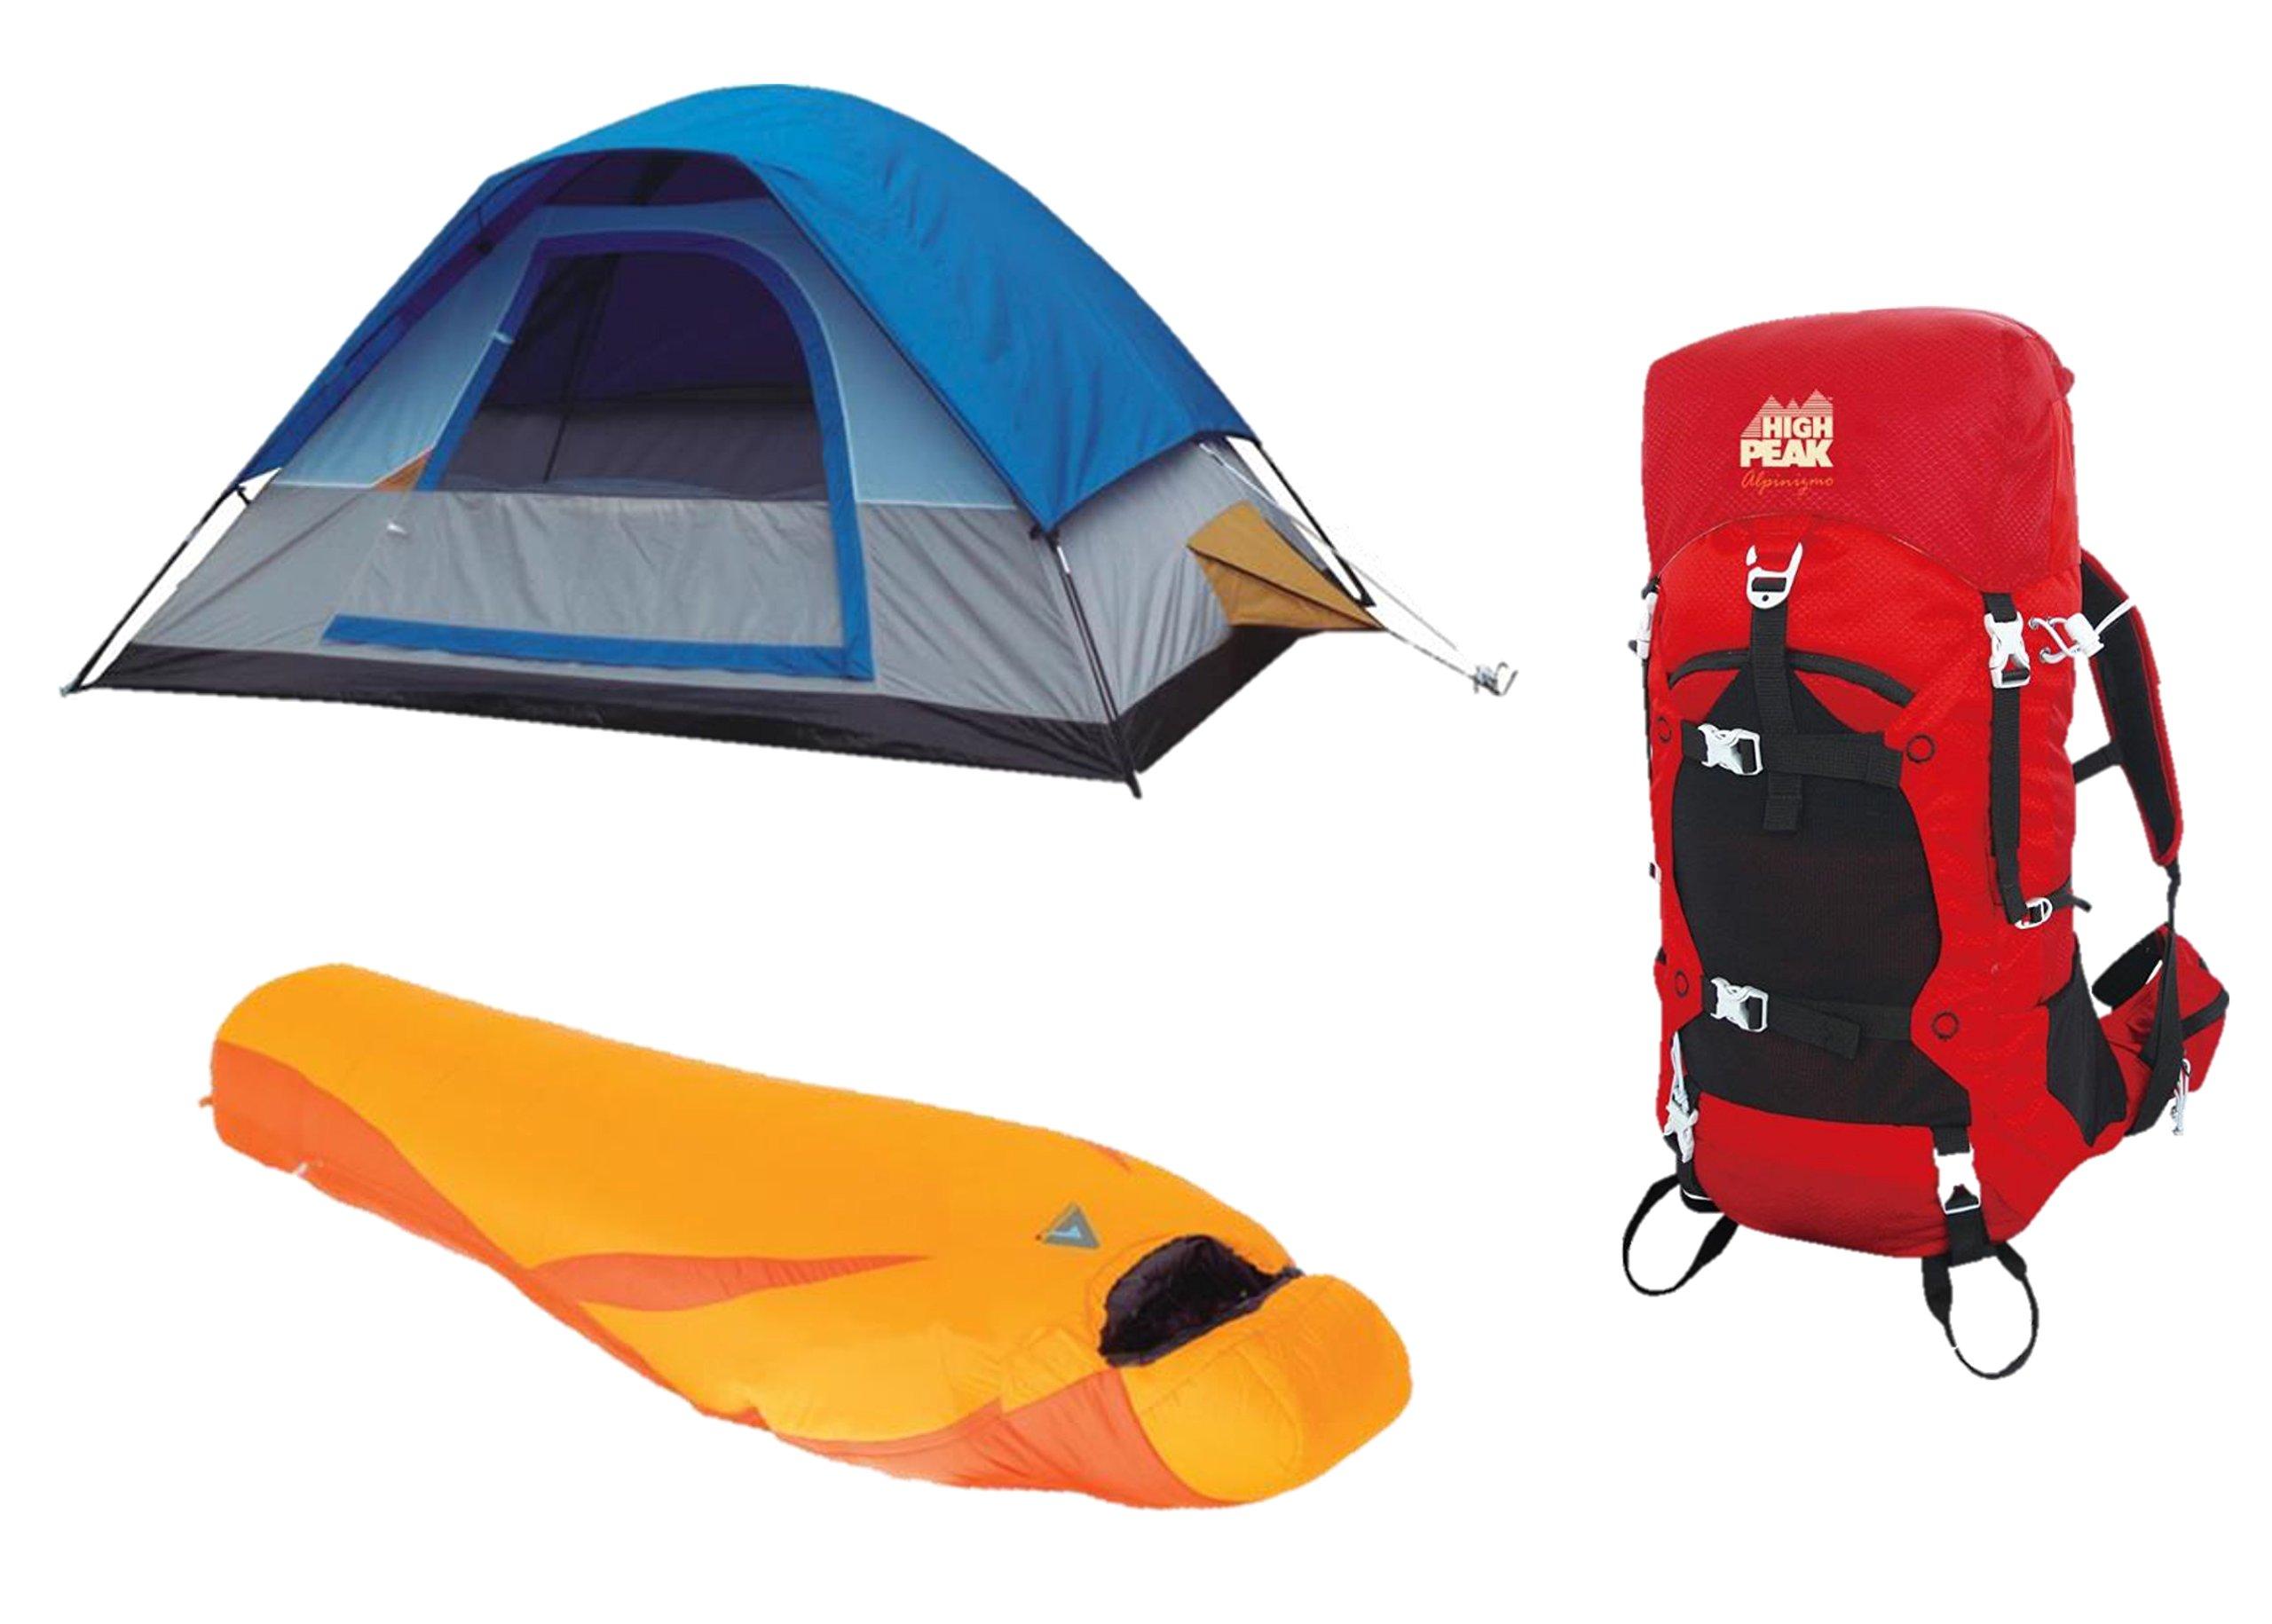 Alpinizmo-High-Peak-USA-Ultra-Lite-0F-Sleeping-Bag-5-Men-Tent-40-Liter-Pack-RedOrangeBlue-One-Size